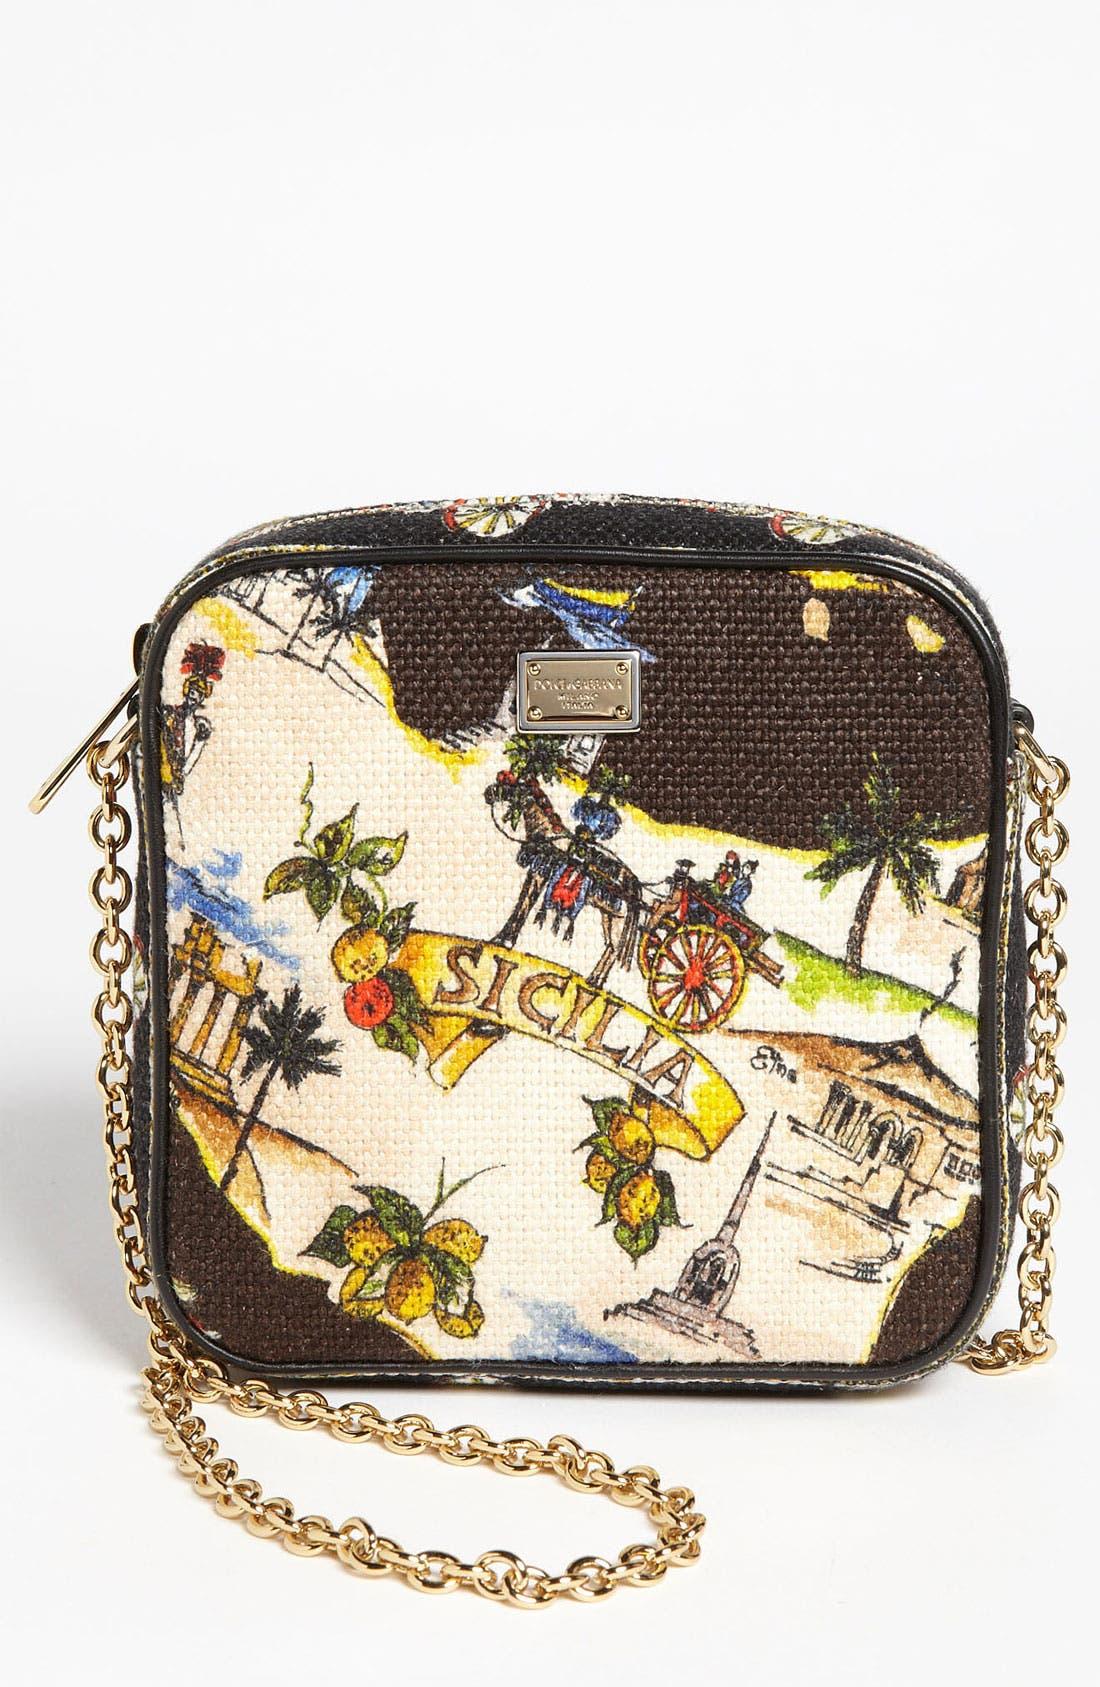 Main Image - Dolce&Gabbana 'Miss Glam - Sicily' Crossbody Bag